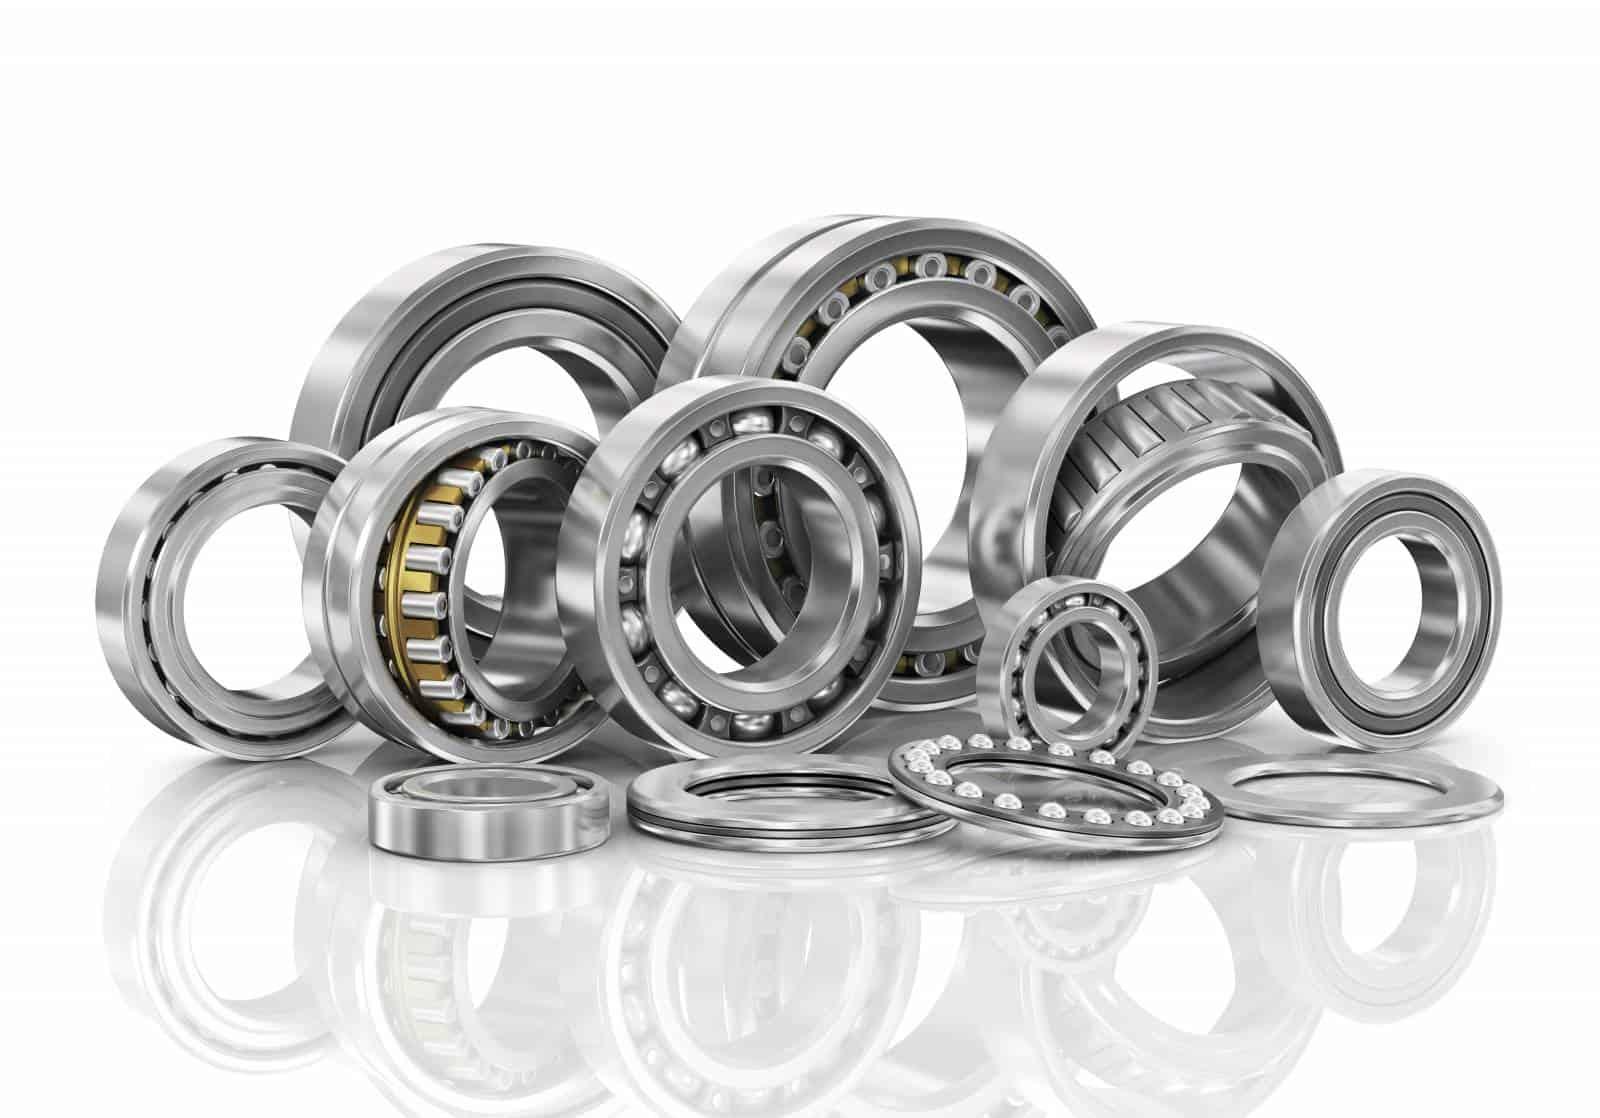 Jenis bearing